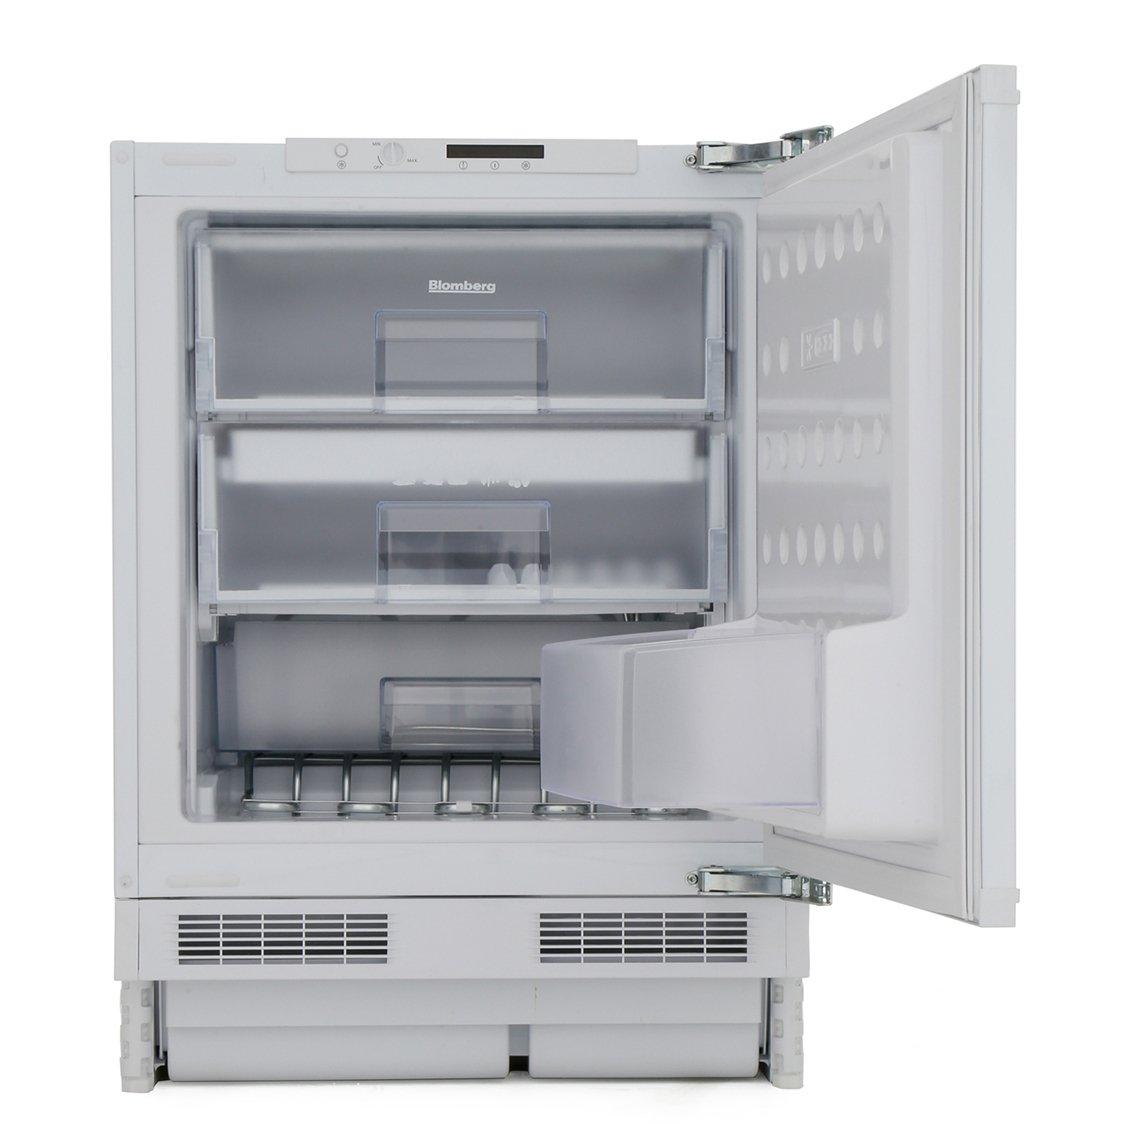 Frost free built under freezer